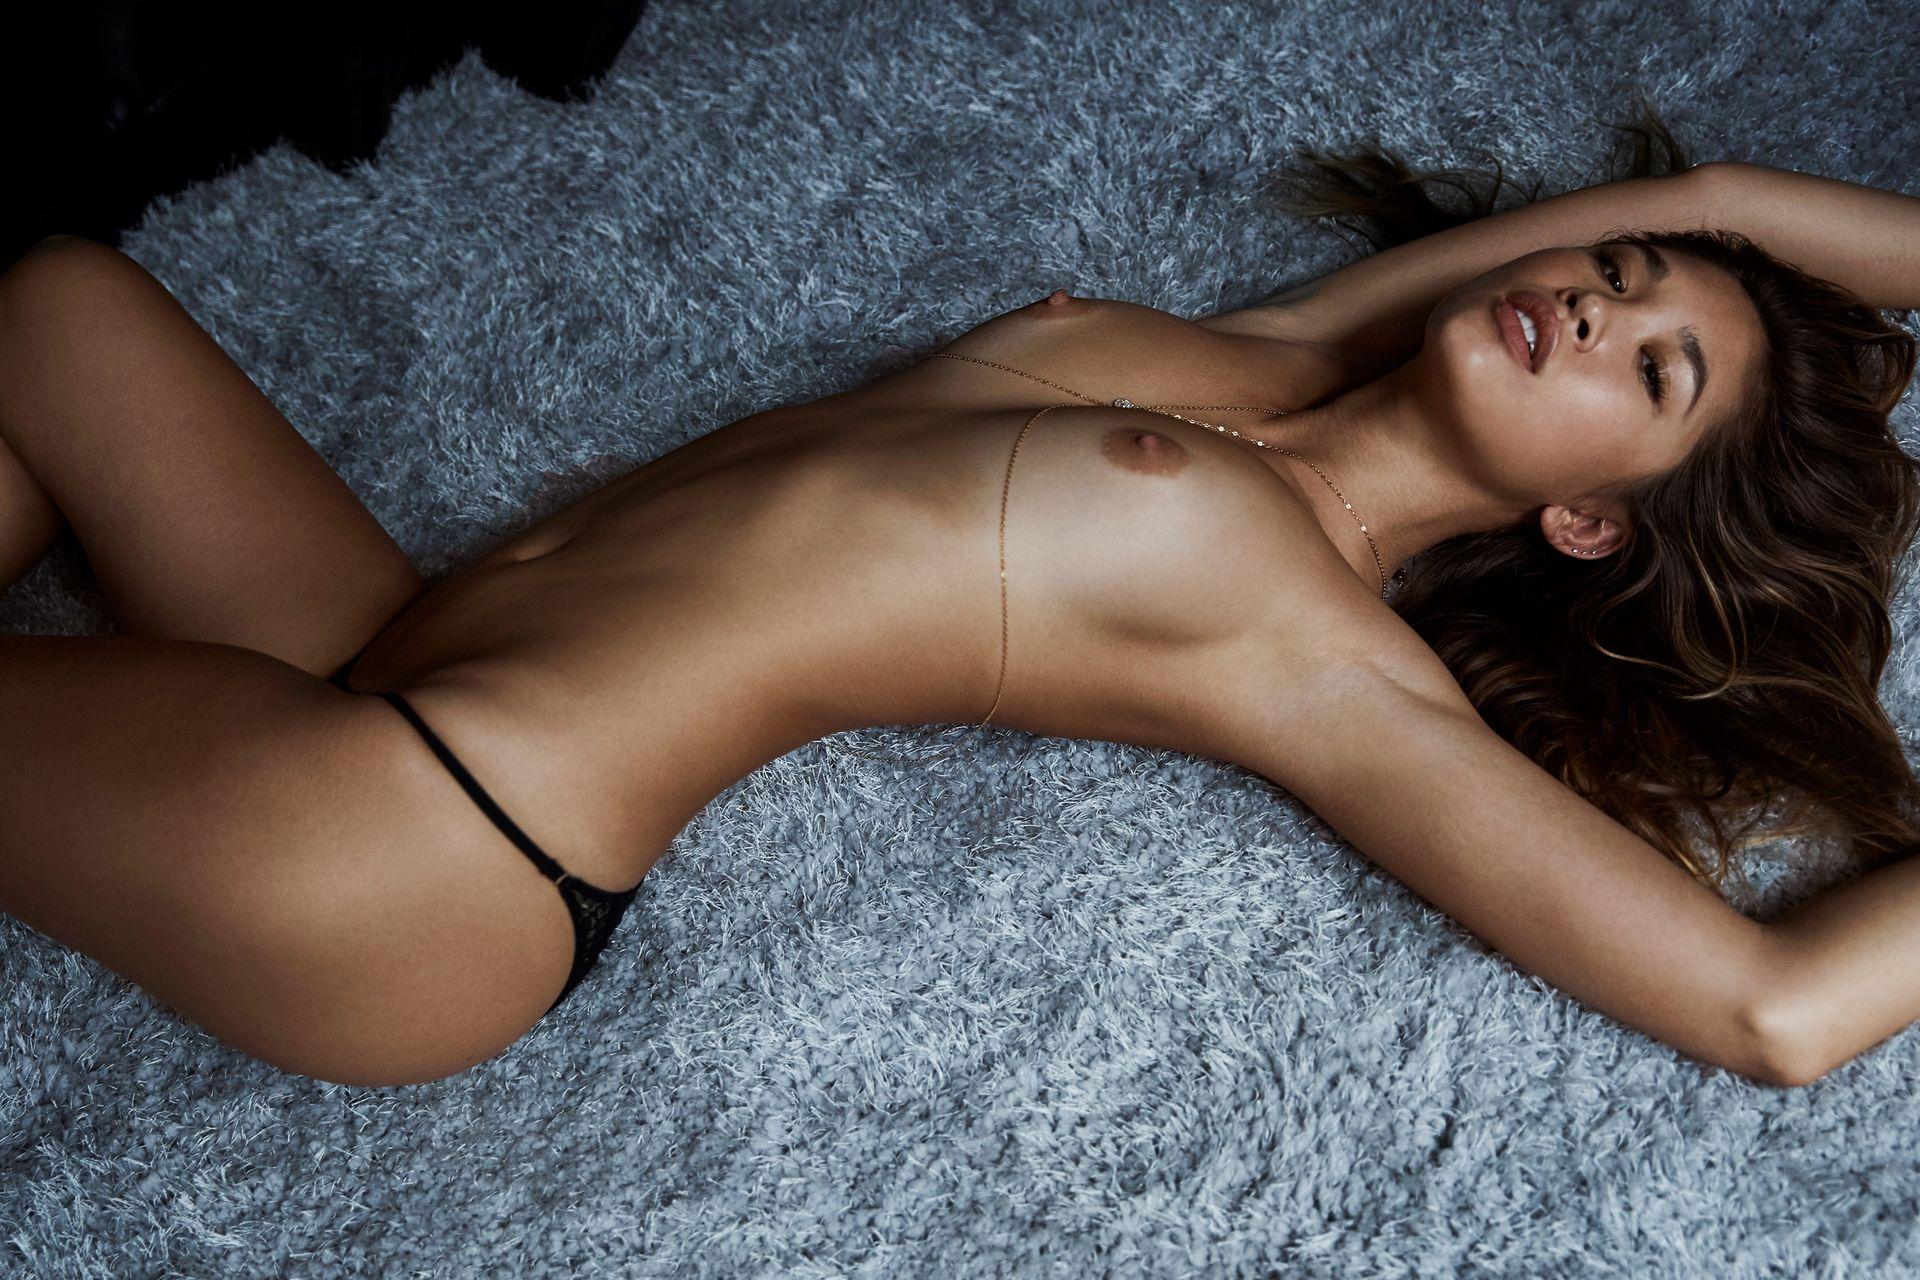 Jocelyn chew nude leaked pics sexy bikini images